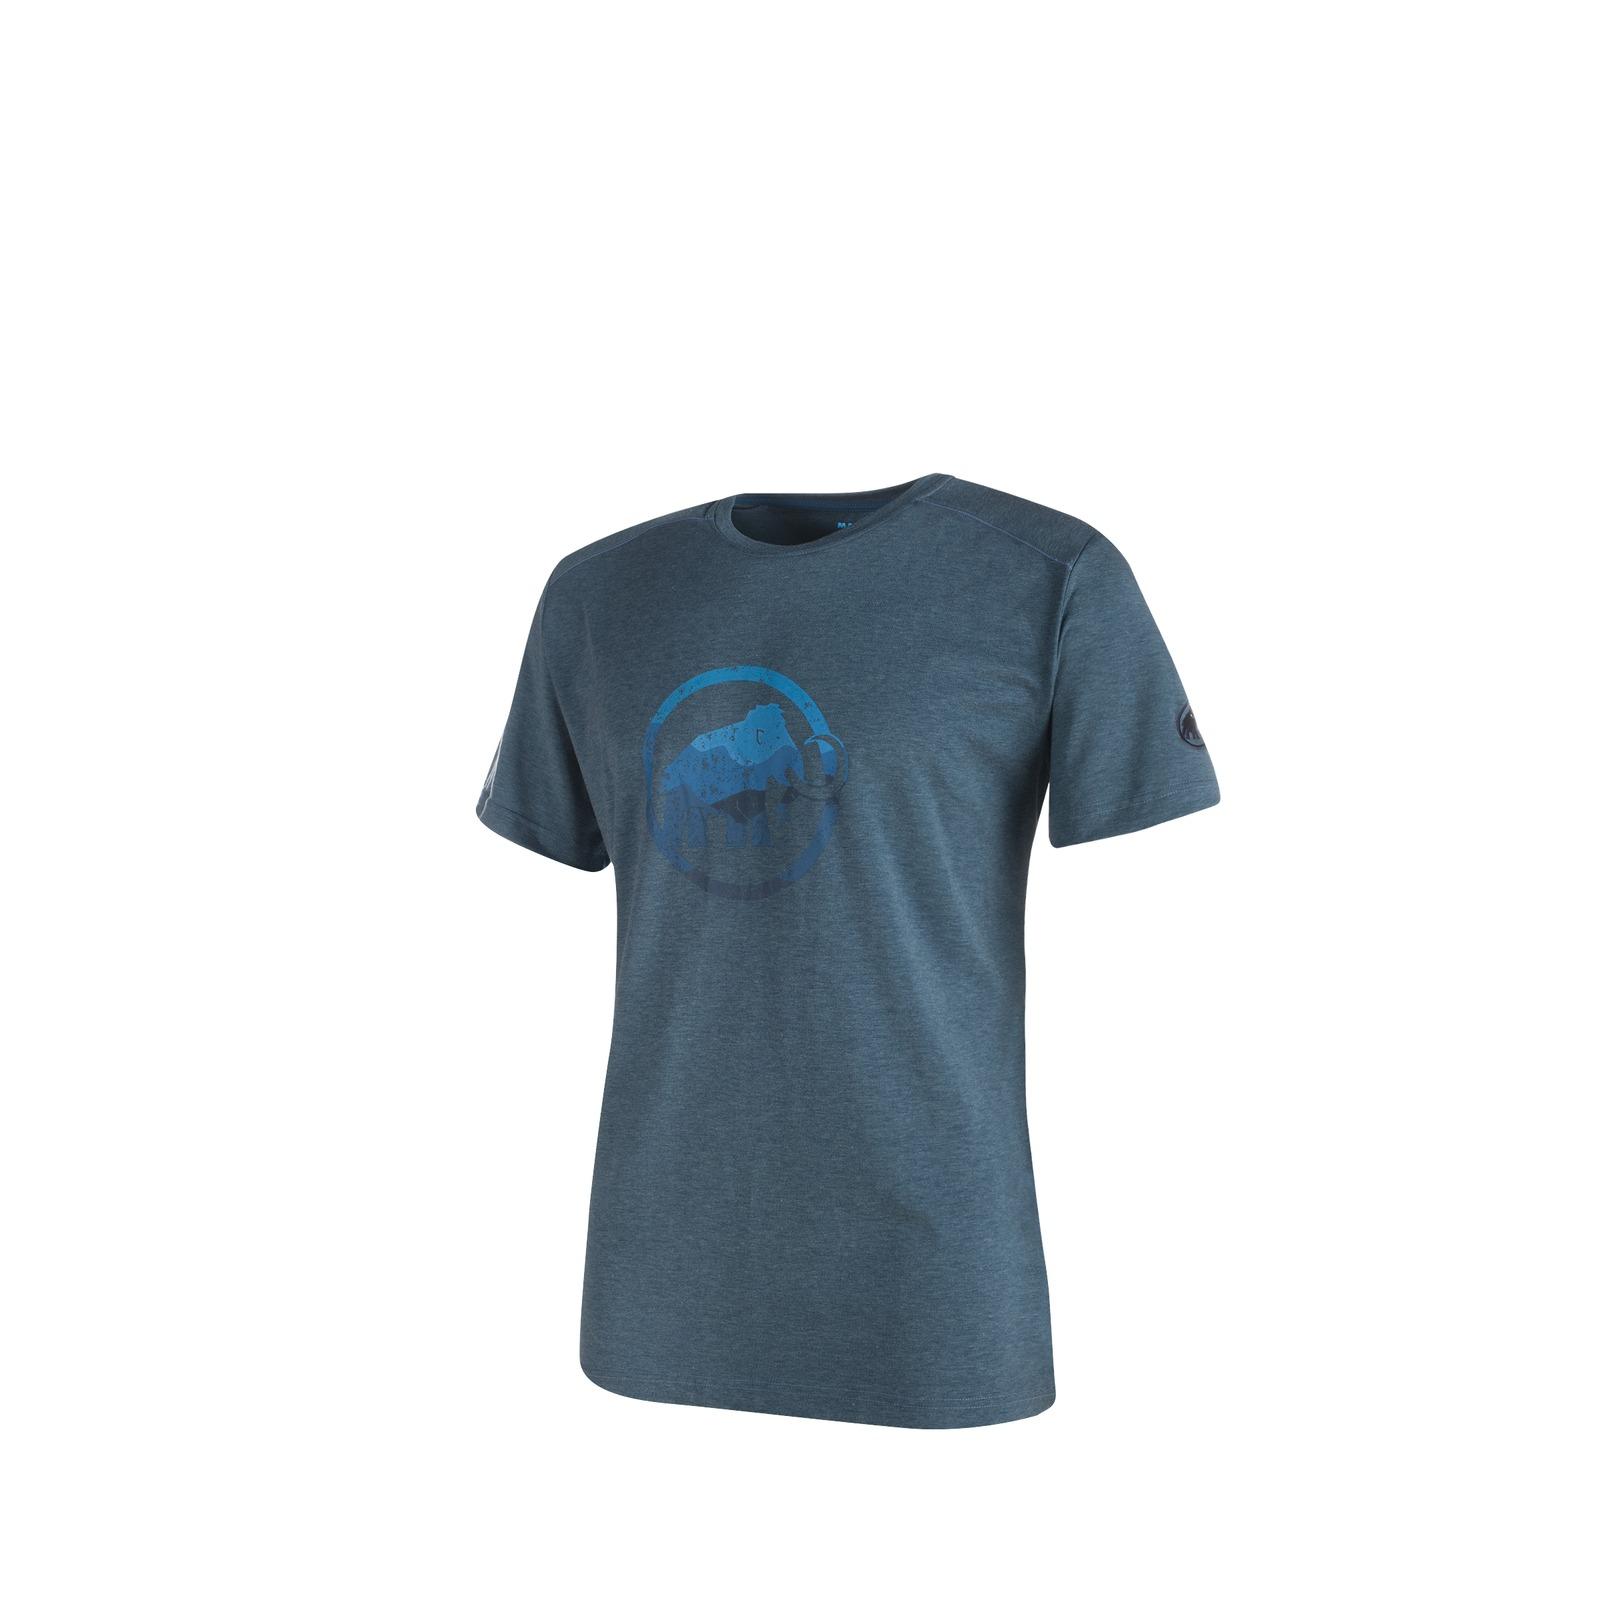 Mammut Trovat Shirt Men orion melange Herren Funktionsshirt blau